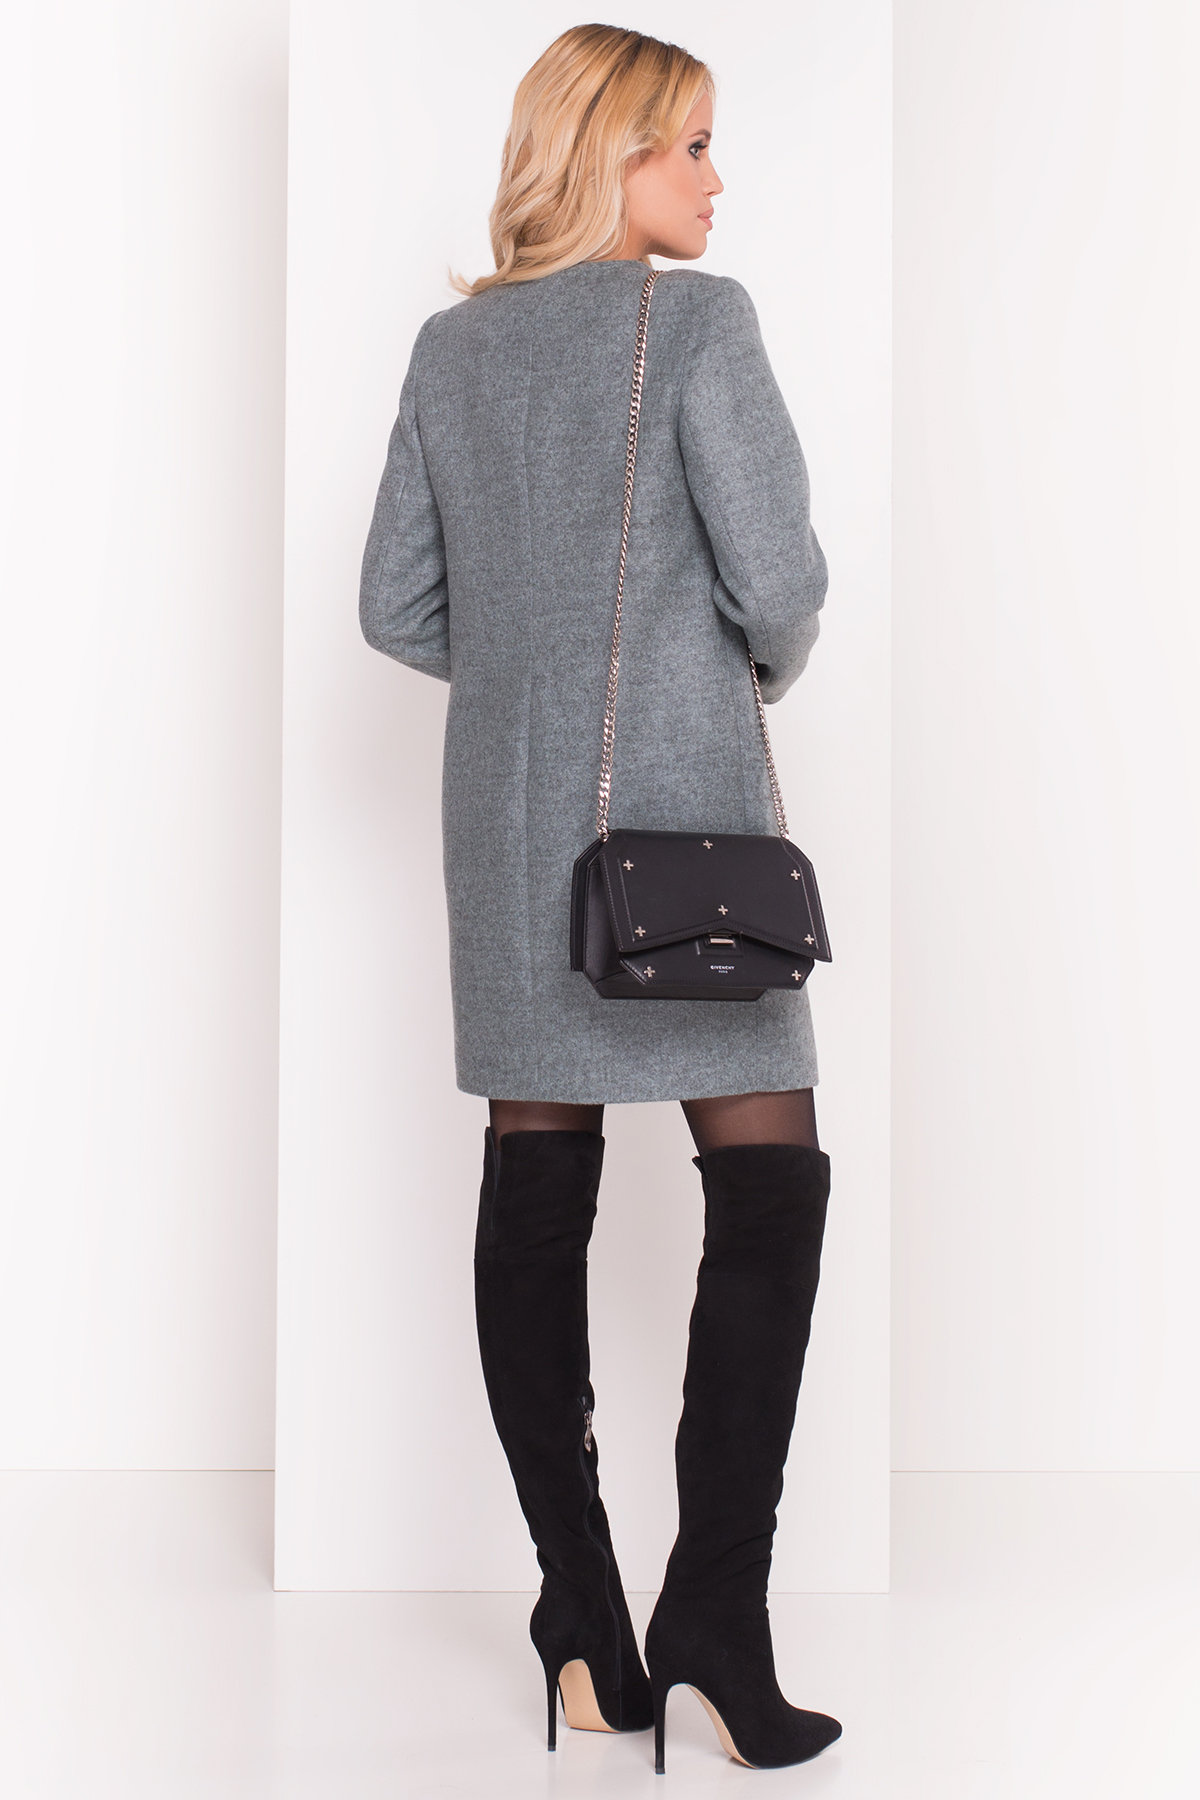 Демисезонное пальто Ферран 5369 АРТ. 37437 Цвет: Олива - фото 3, интернет магазин tm-modus.ru